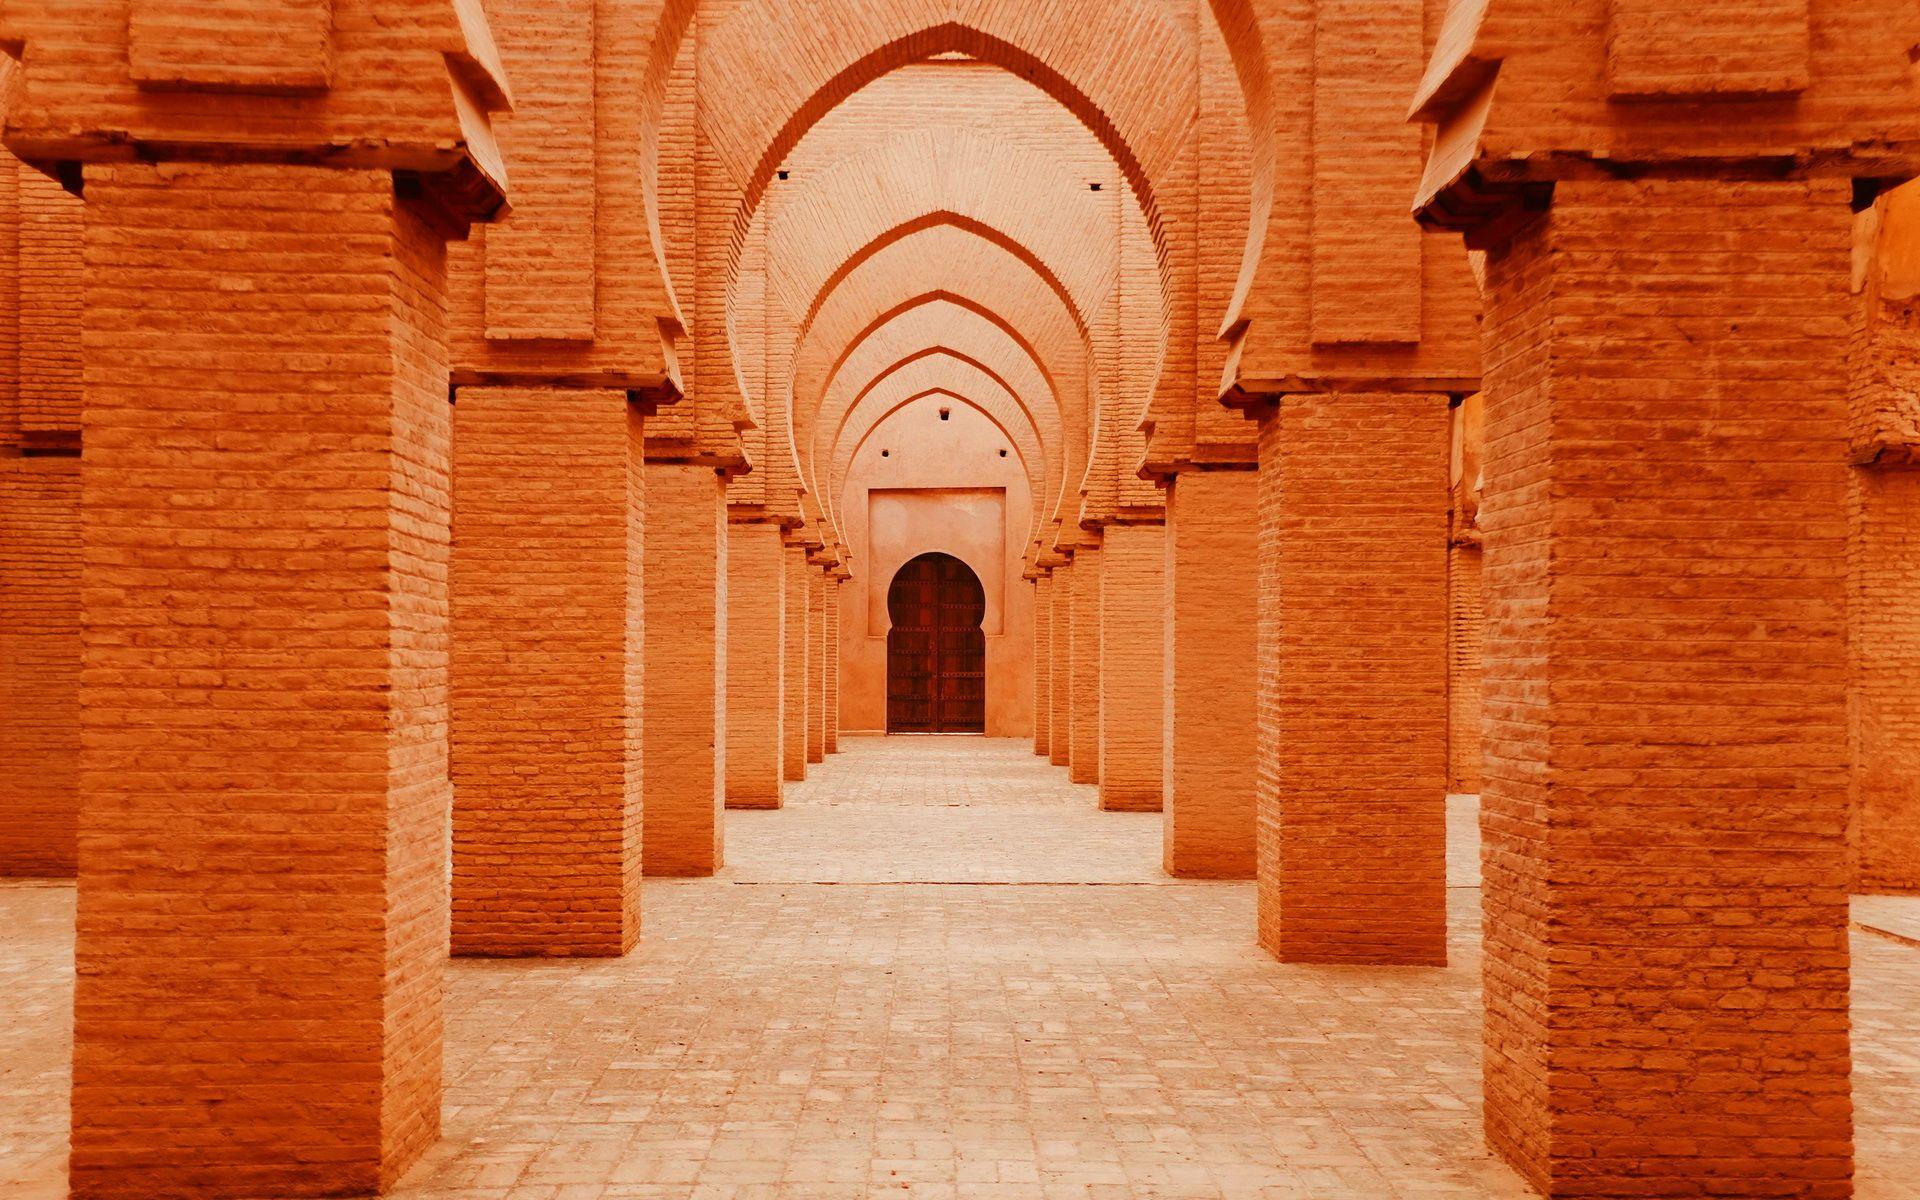 Active Treks Morocco - Tinmel Mosque tour